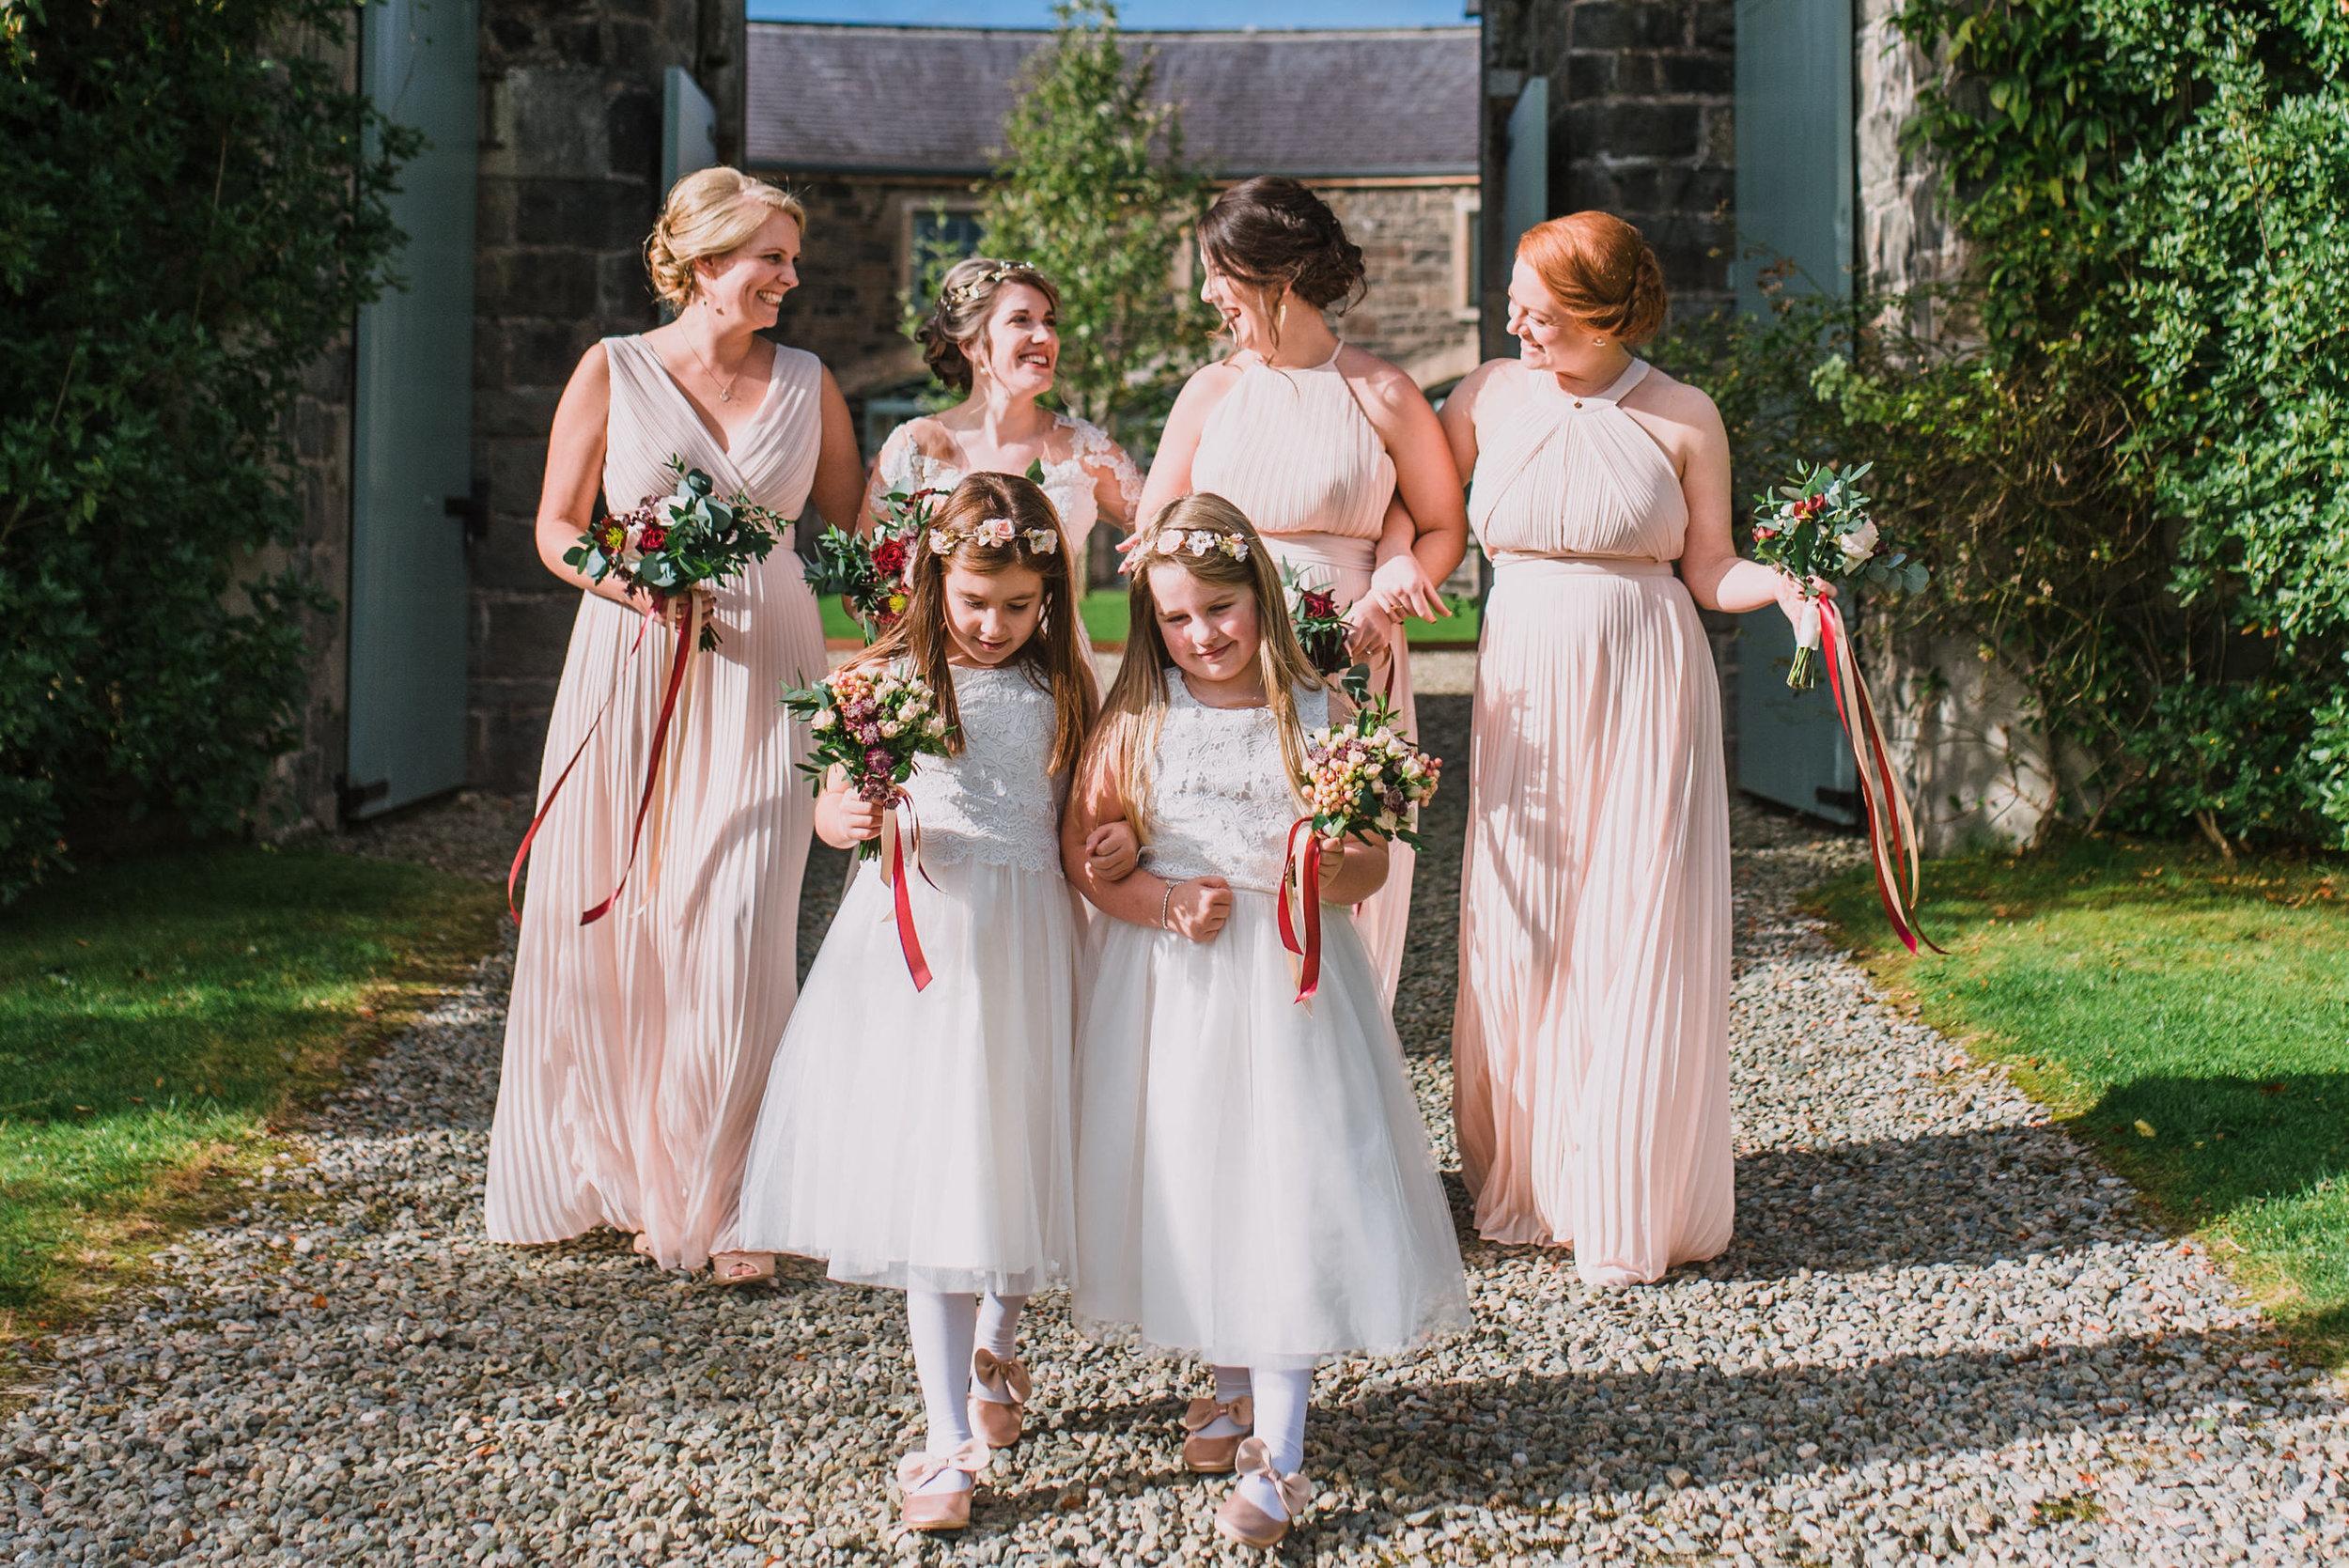 lissanoure castle wedding, northern ireland wedding photographer, romantic northern irish wedding venue, castle wedding ireland, natural wedding photography ni (80).jpg